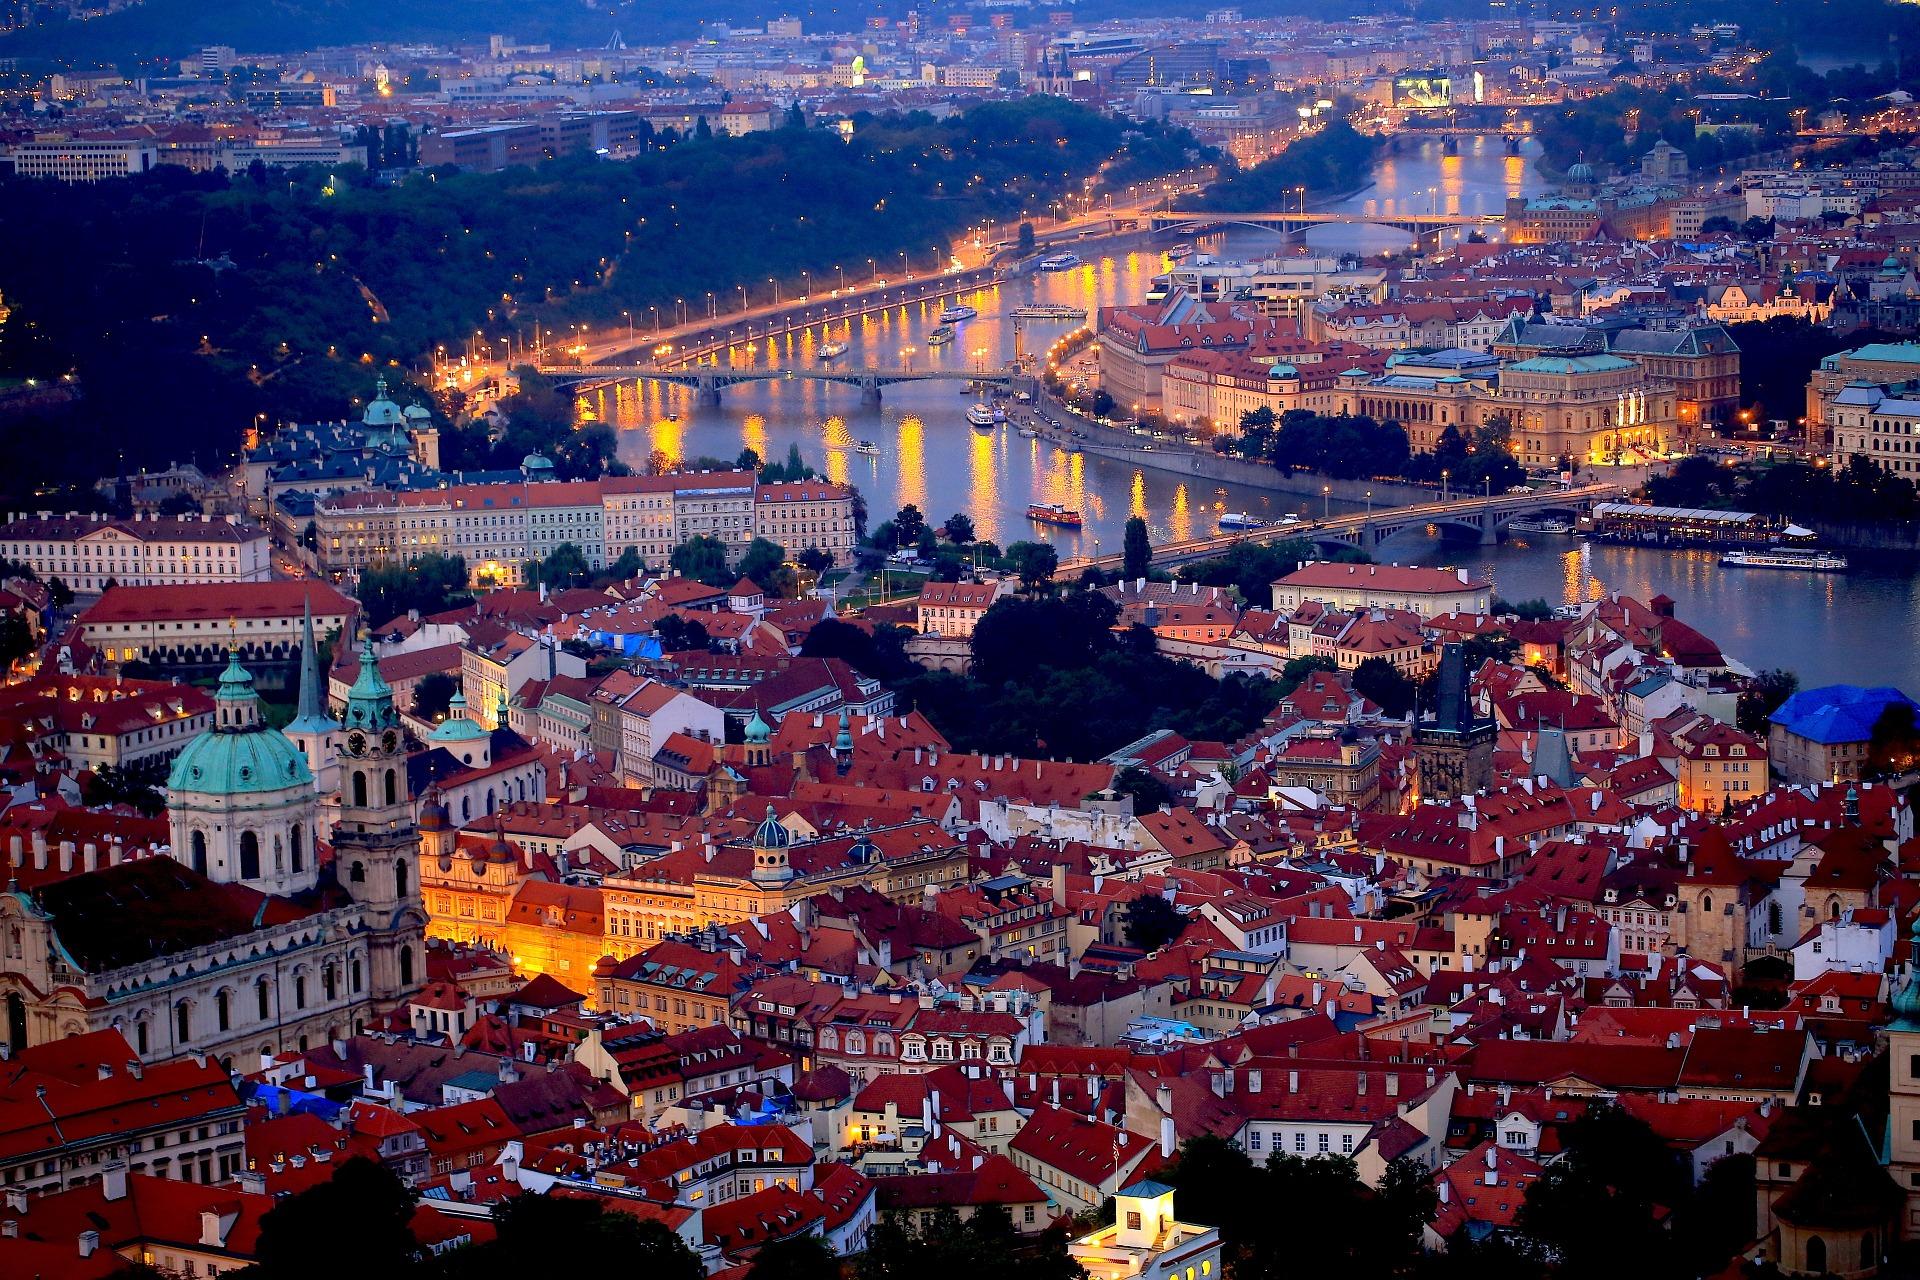 Excursie Praga Piața de Crăciun Revelion 2020 noaptea